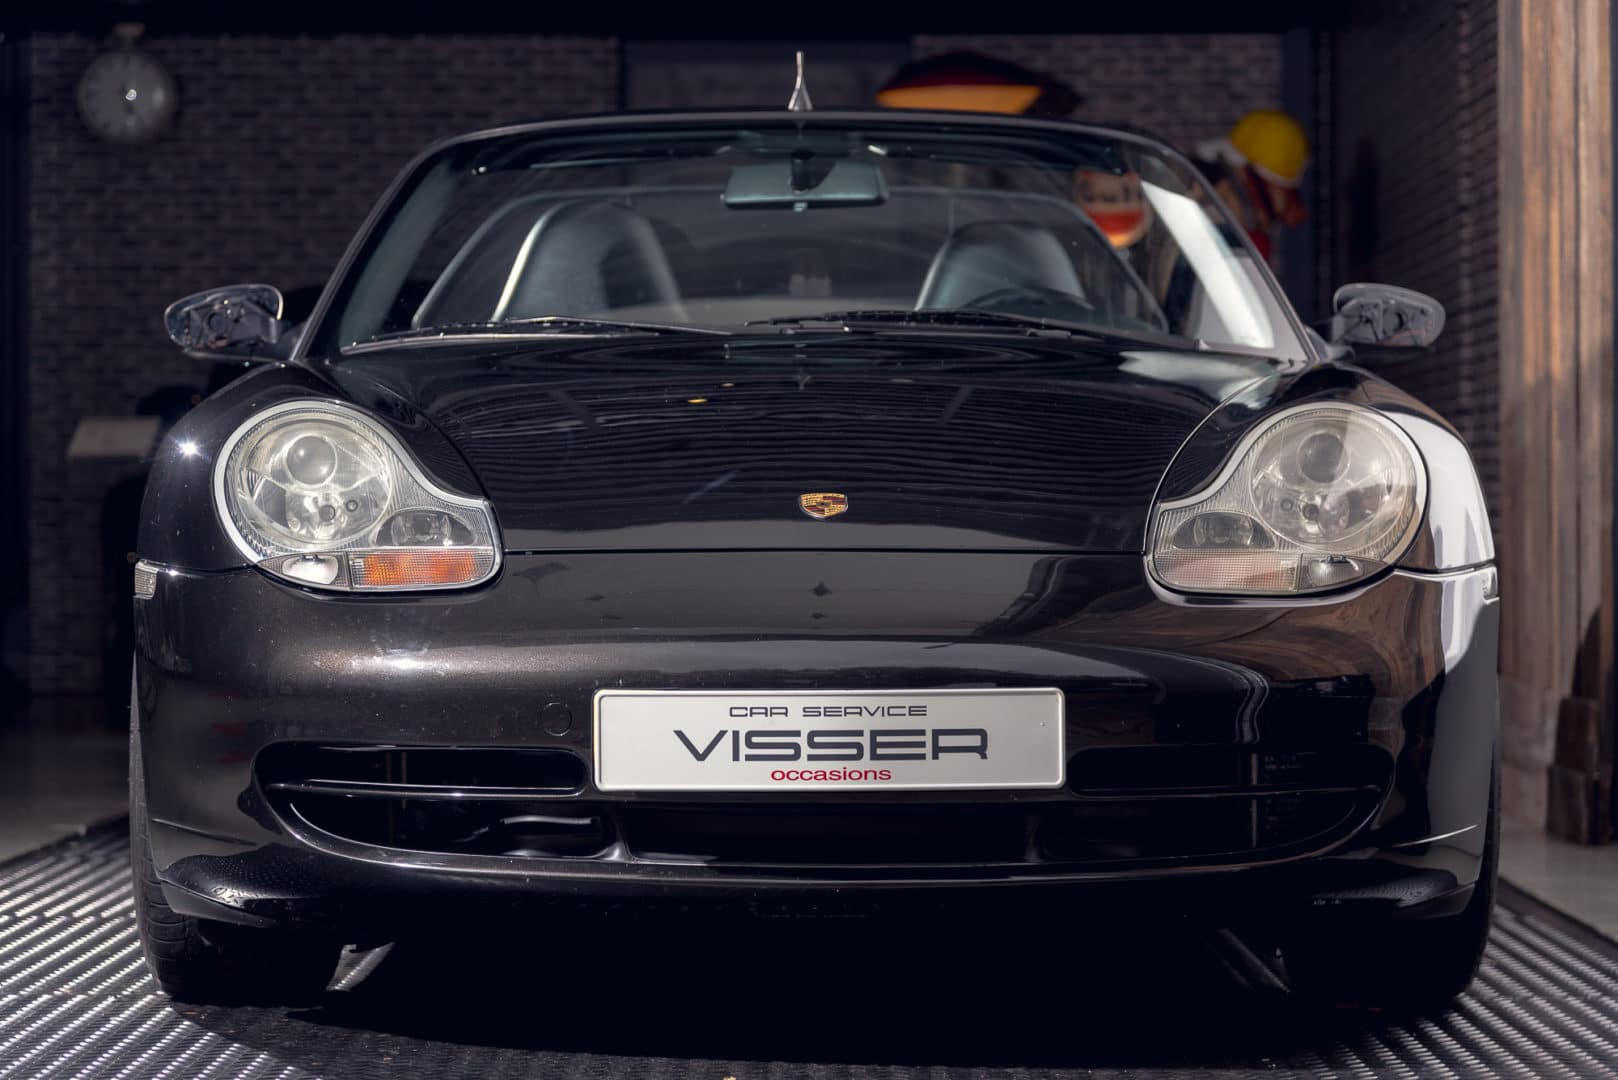 Porsche 996 Carrera 2 Cabrio